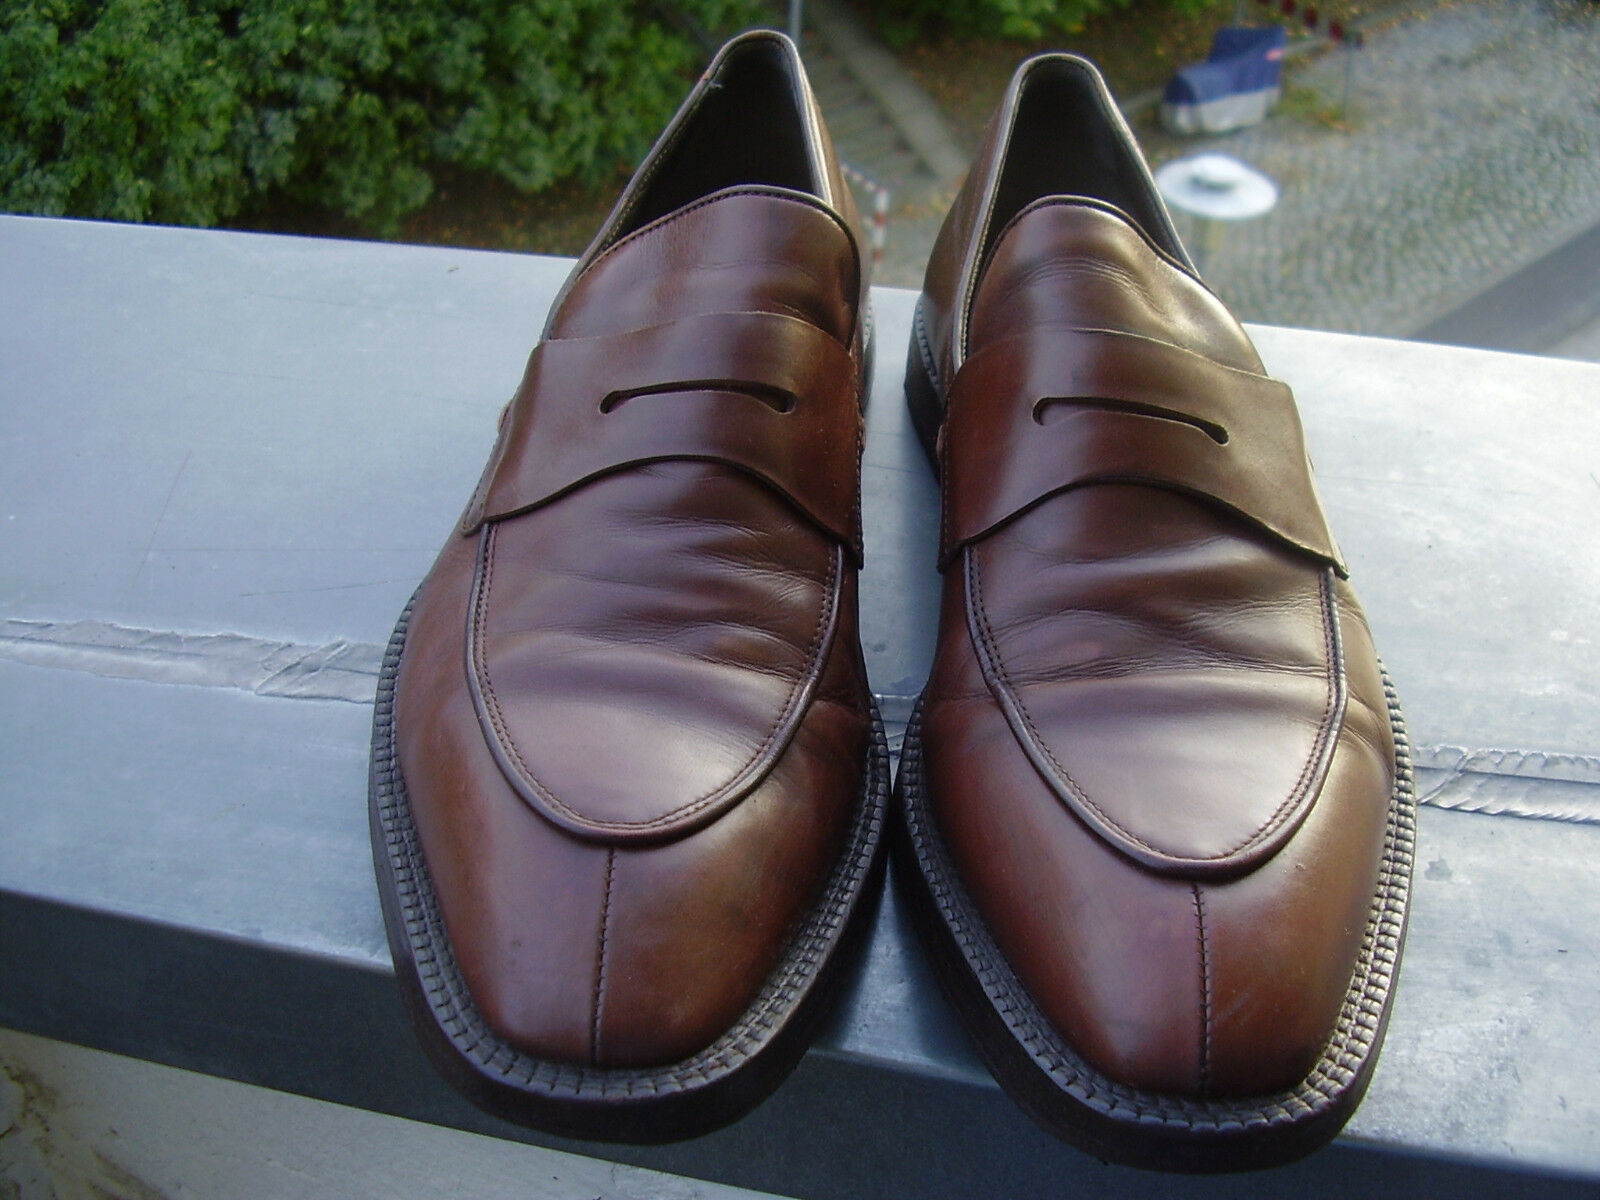 Schuhe Boss braun Slipper Made in Italy Größe 9 B/D neue Hacke u. Sohle